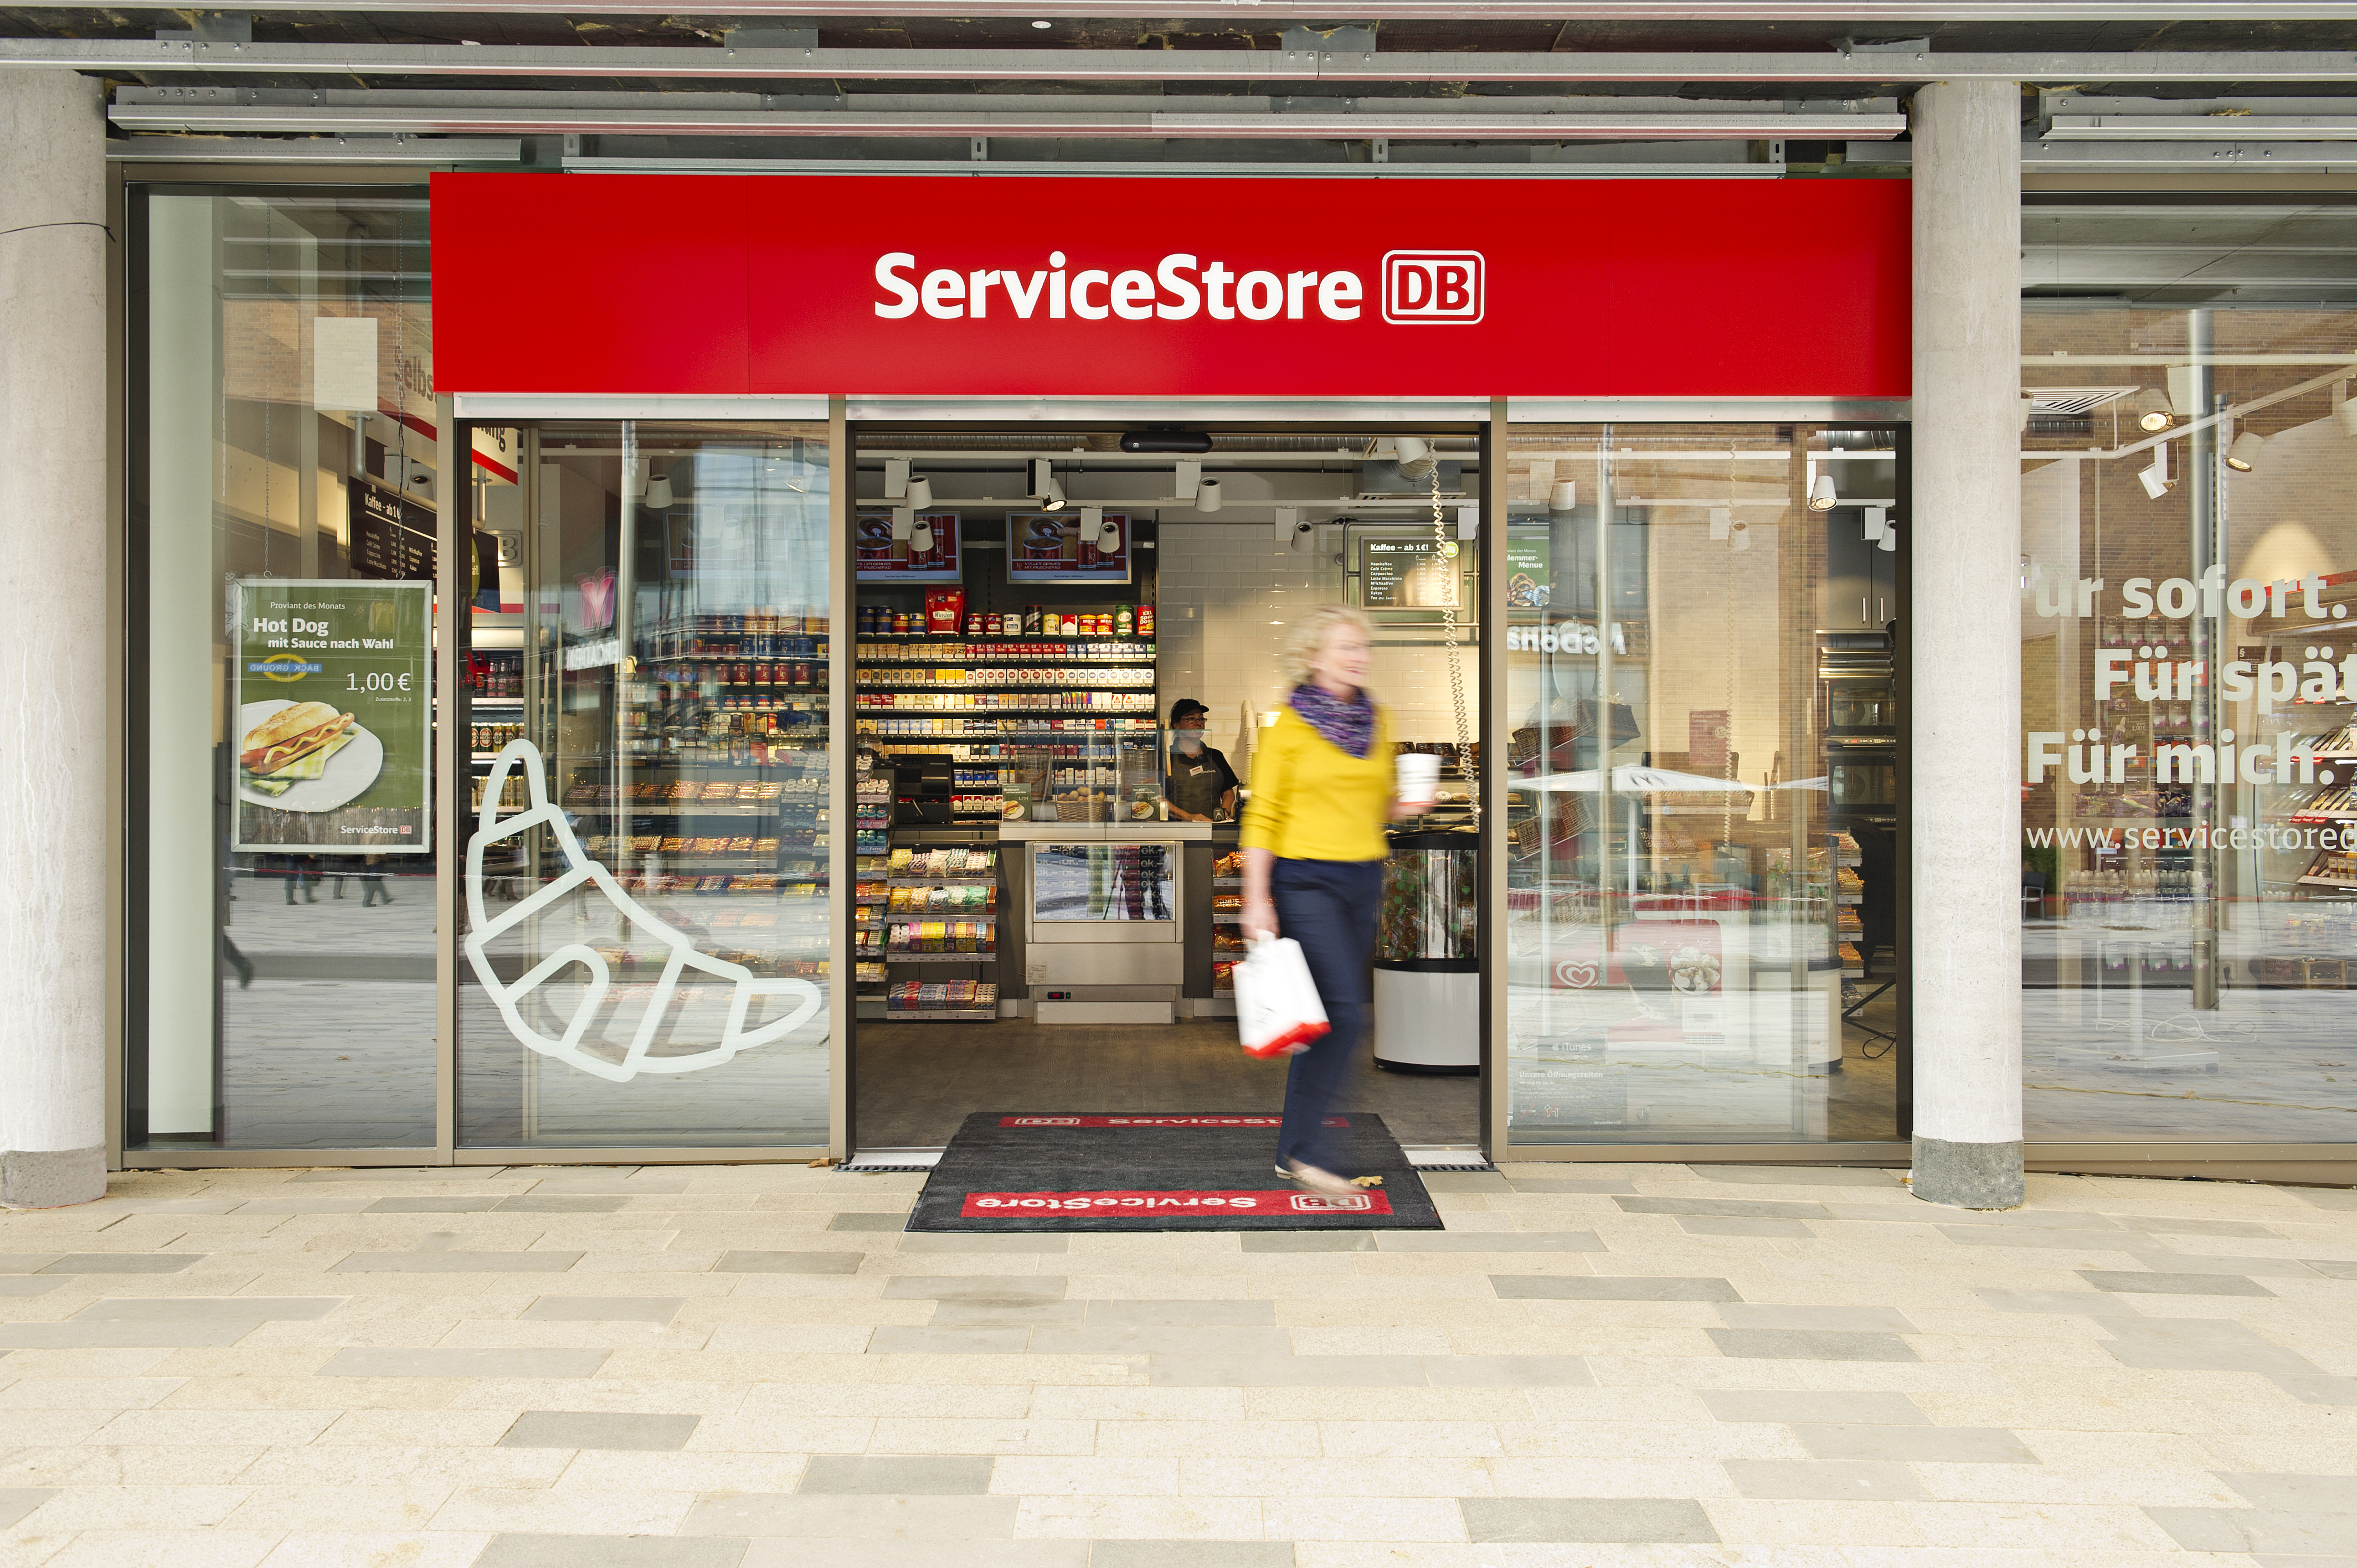 ServiceStore DB - S-Bahnhof Messe Nord